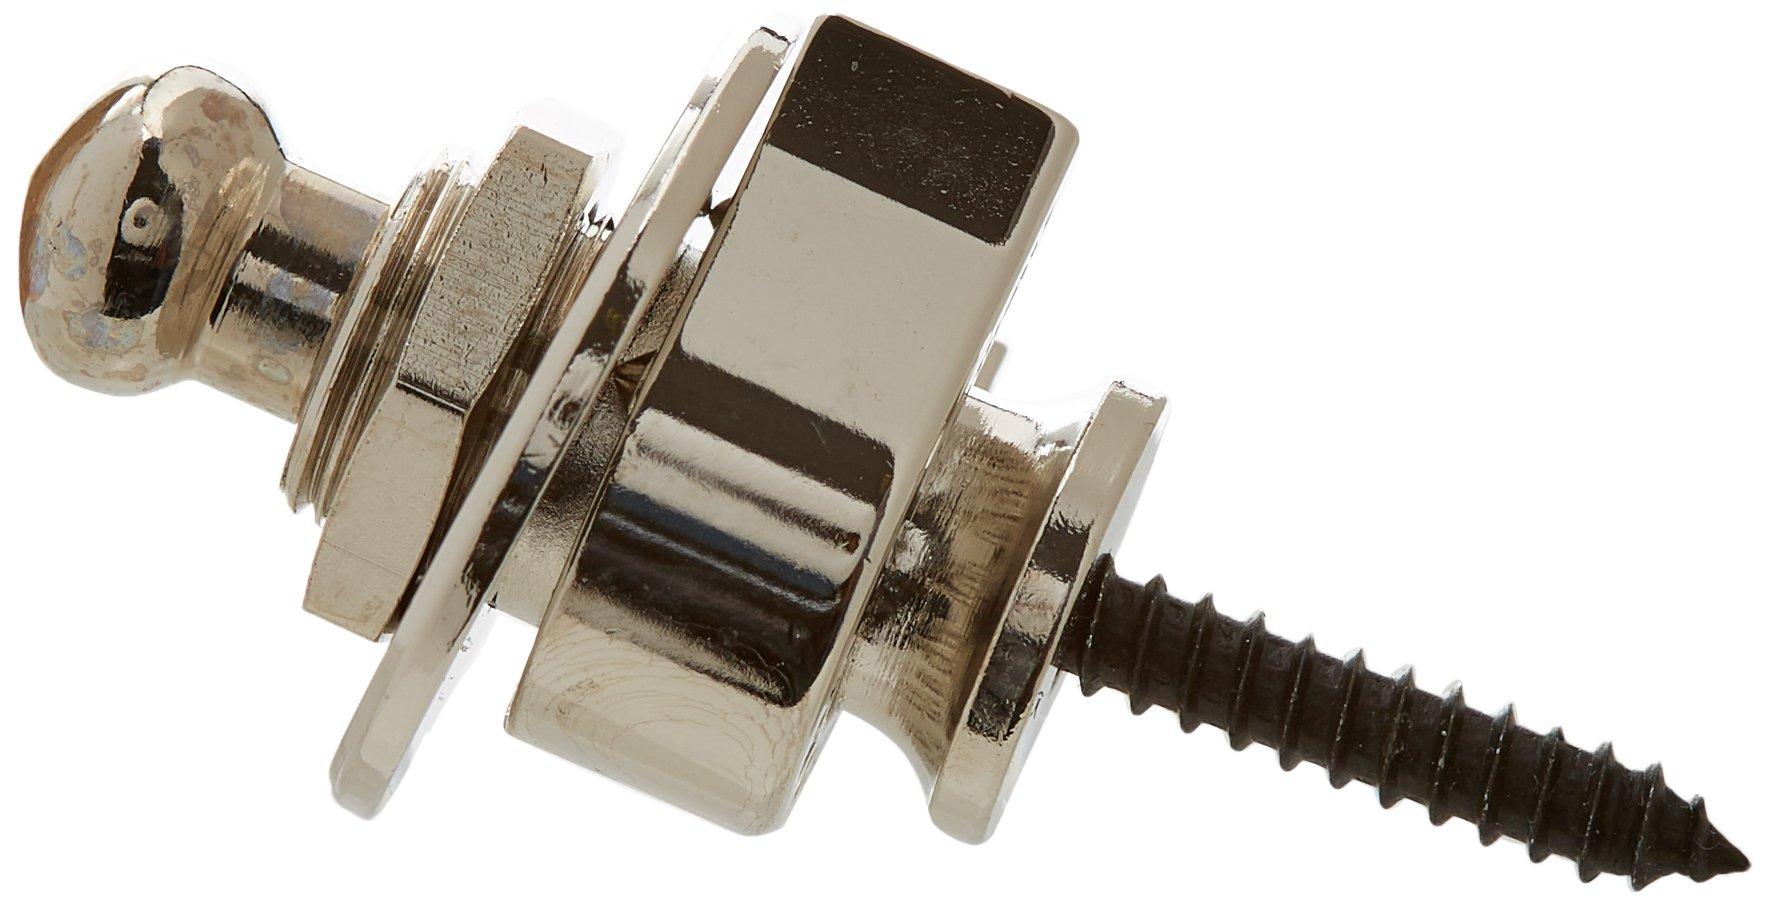 Schaller momo-jtk 14010101 Security Straplocks, Nickel